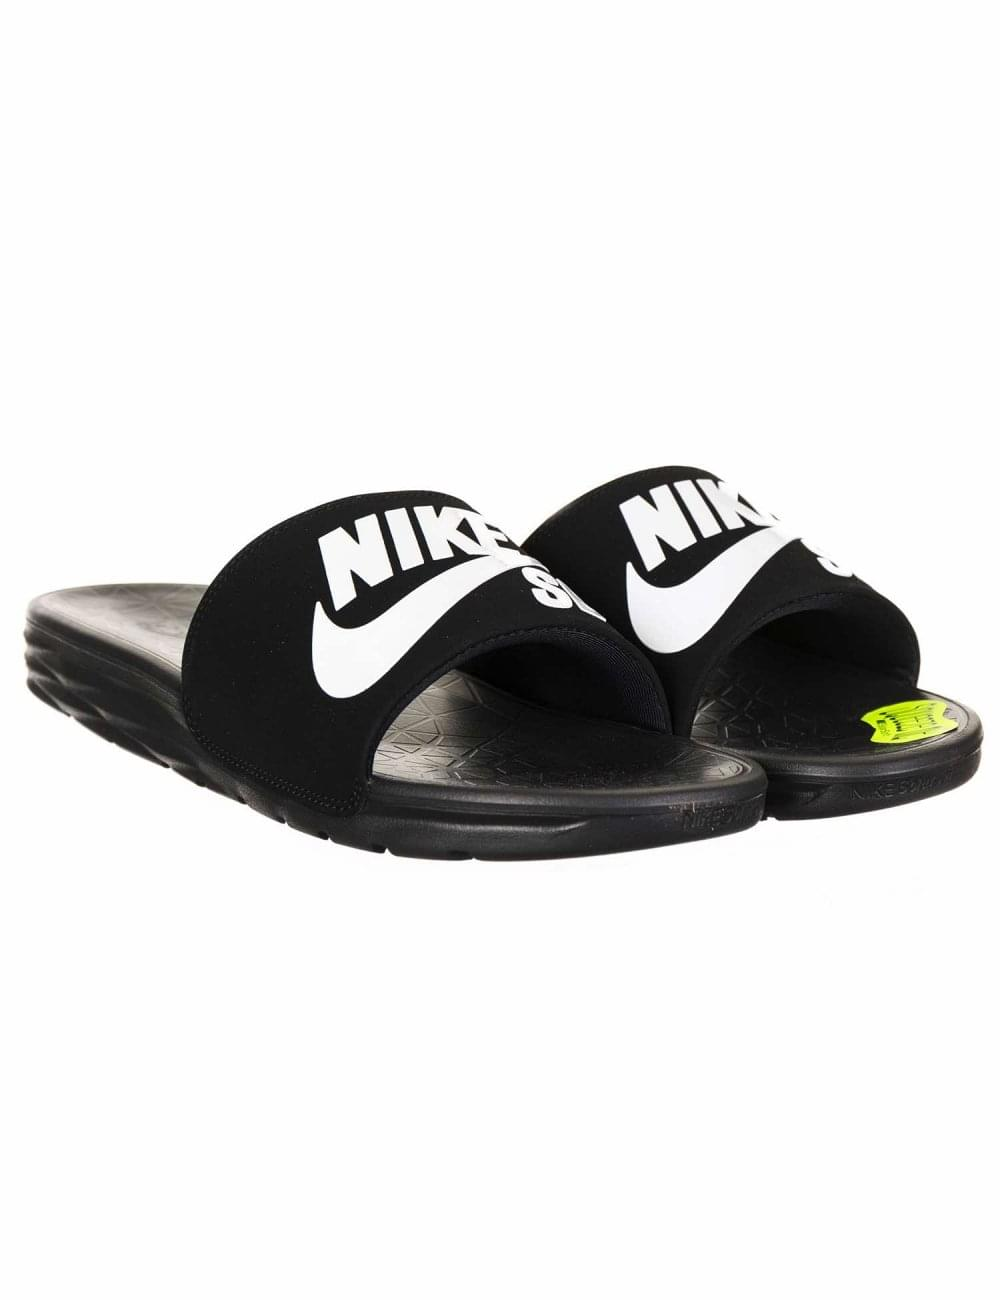 fe9699b945e Nike SB Benassi Solarsoft Sliders - Black White - Trainers from Fat ...